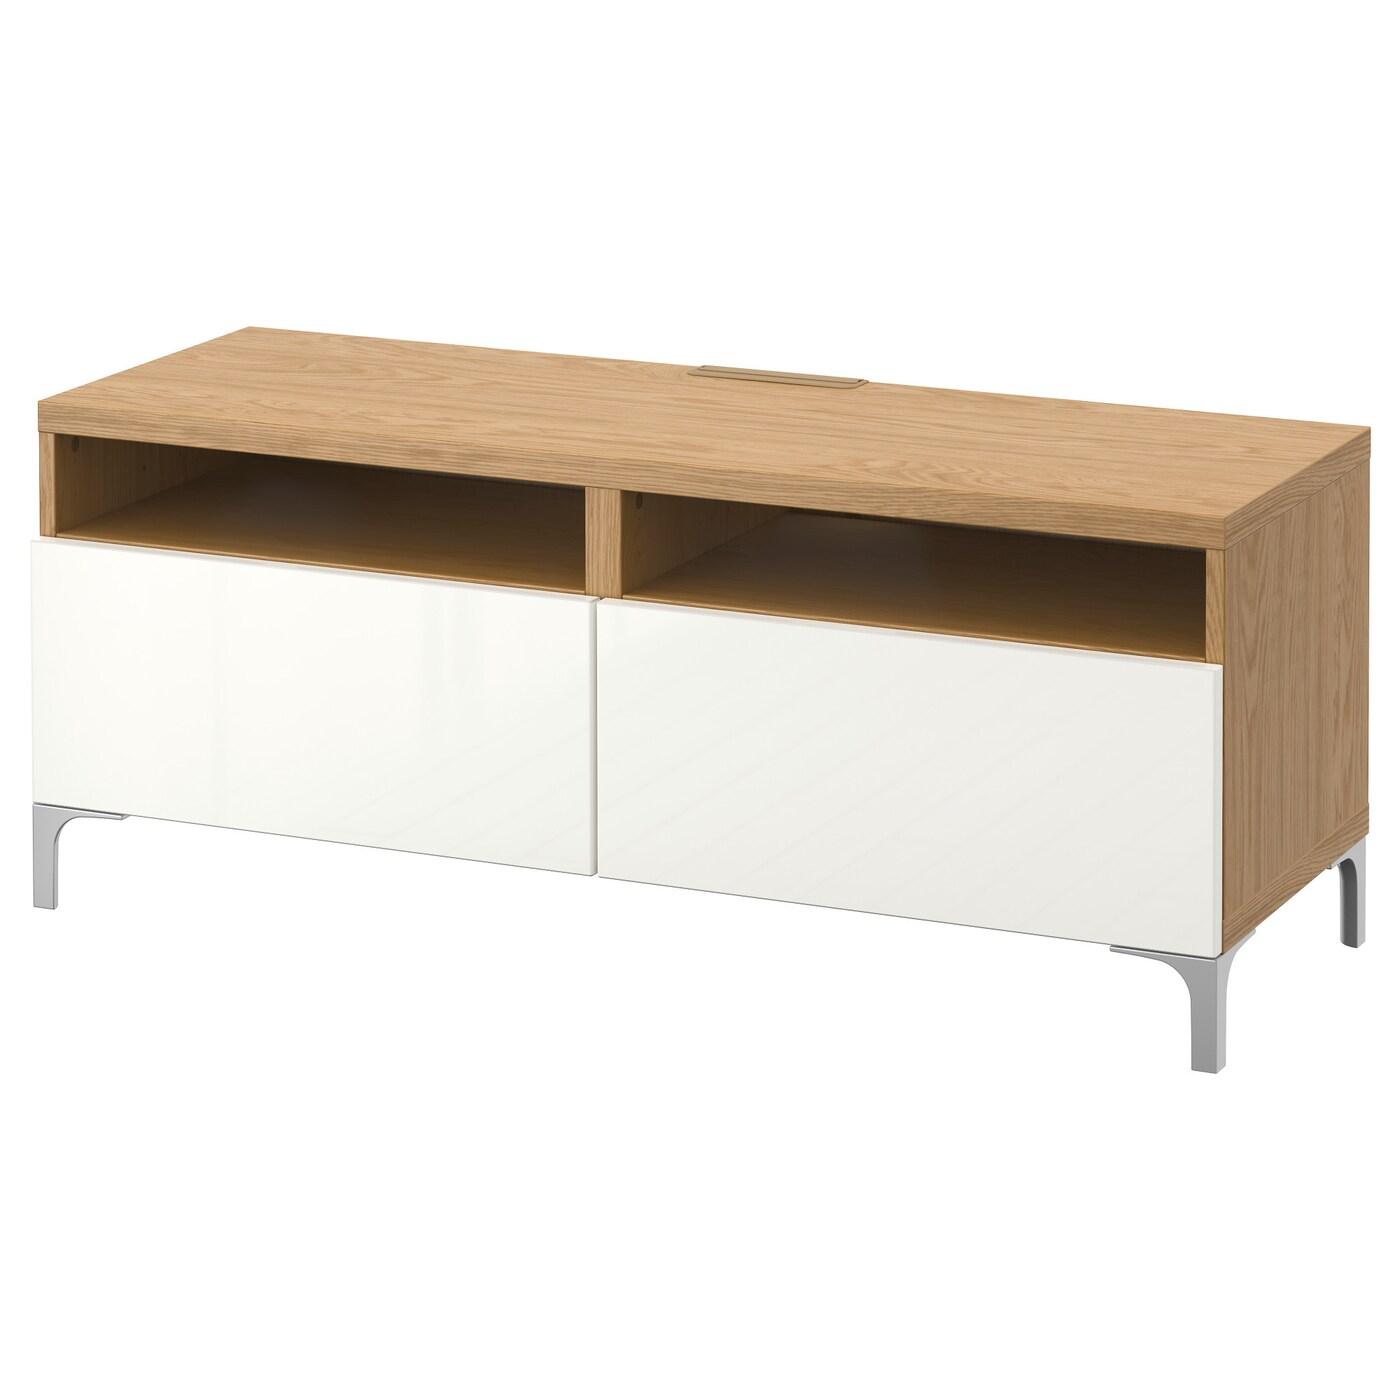 Best Tv Bench With Drawers Oak Effect Selsviken High Gloss White 120x40x48 Cm Ikea